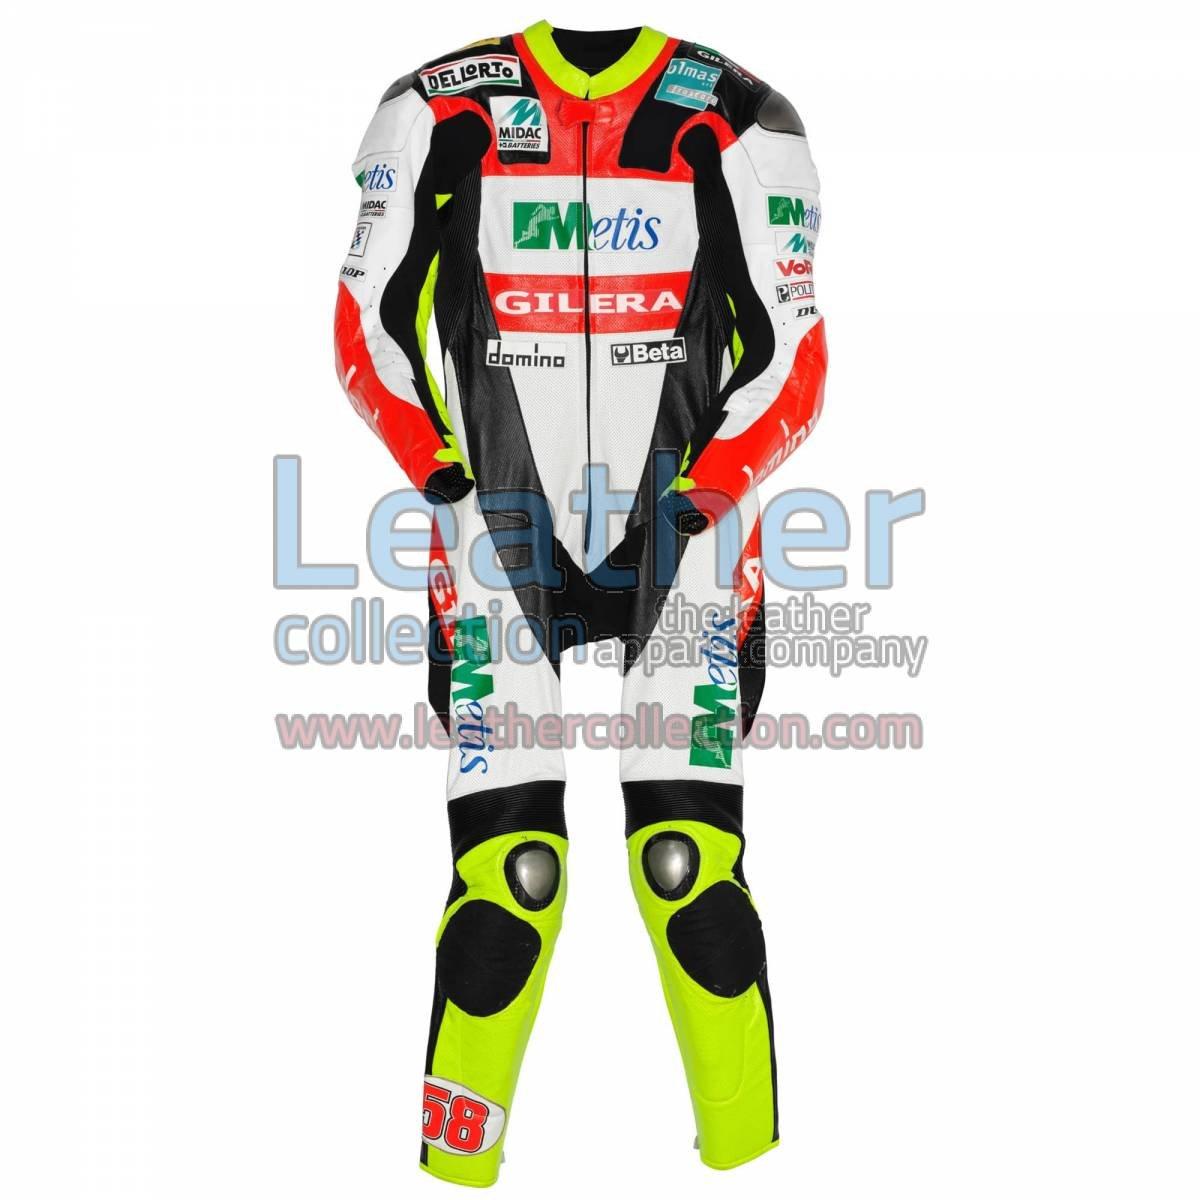 Marco Simoncelli Gilera GP 2008 Leathers